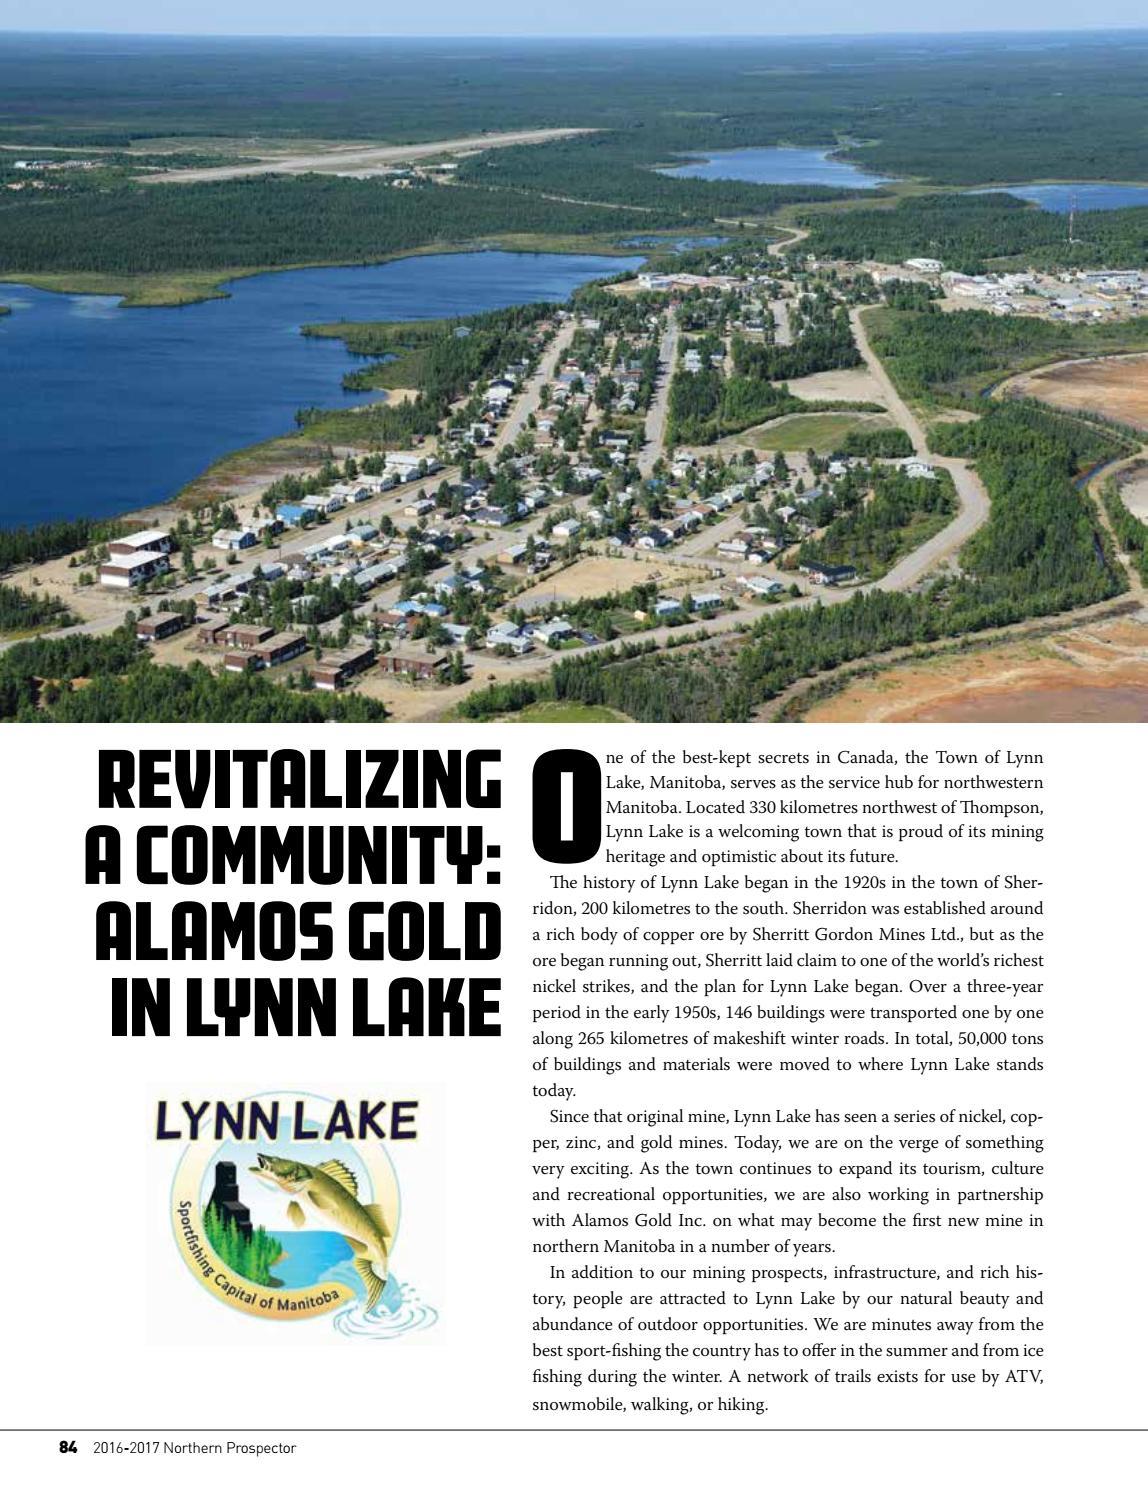 Lynn Lake Manitoba : manitoba, Northern, Prospector, 2016-17, Communications, Issuu